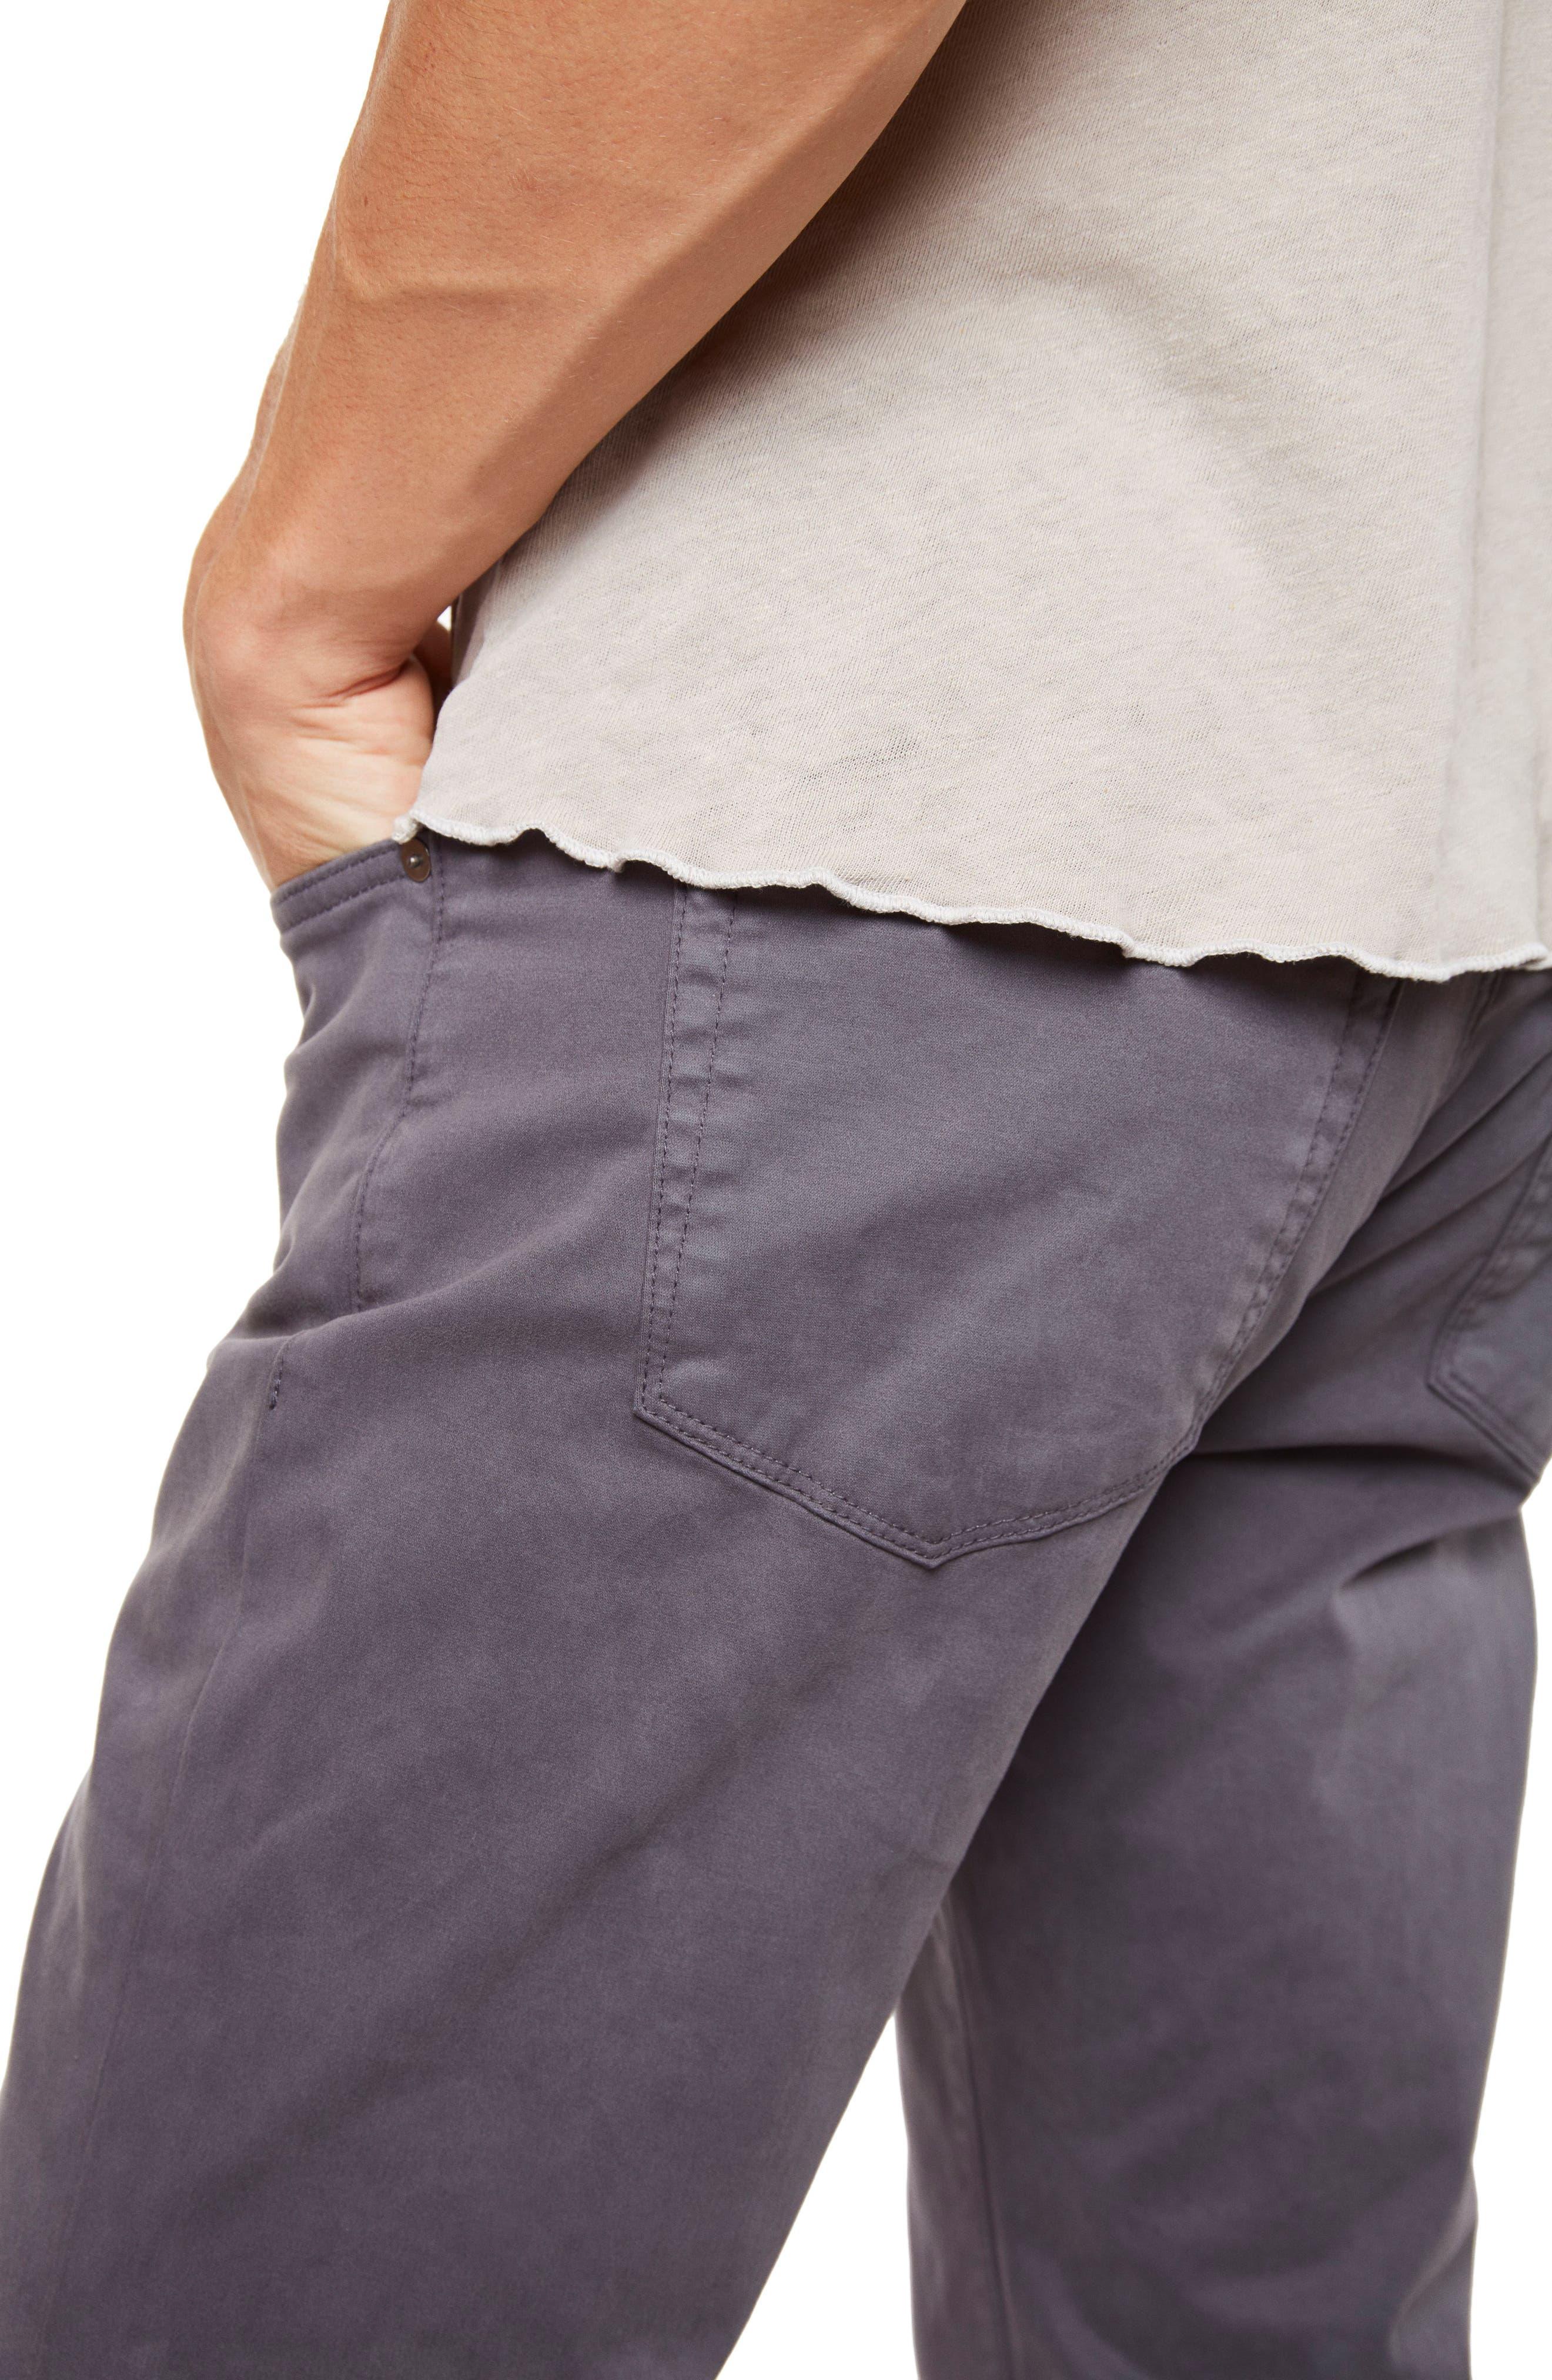 'Kane' Slim Fit Cotton Twill Pants,                             Alternate thumbnail 60, color,